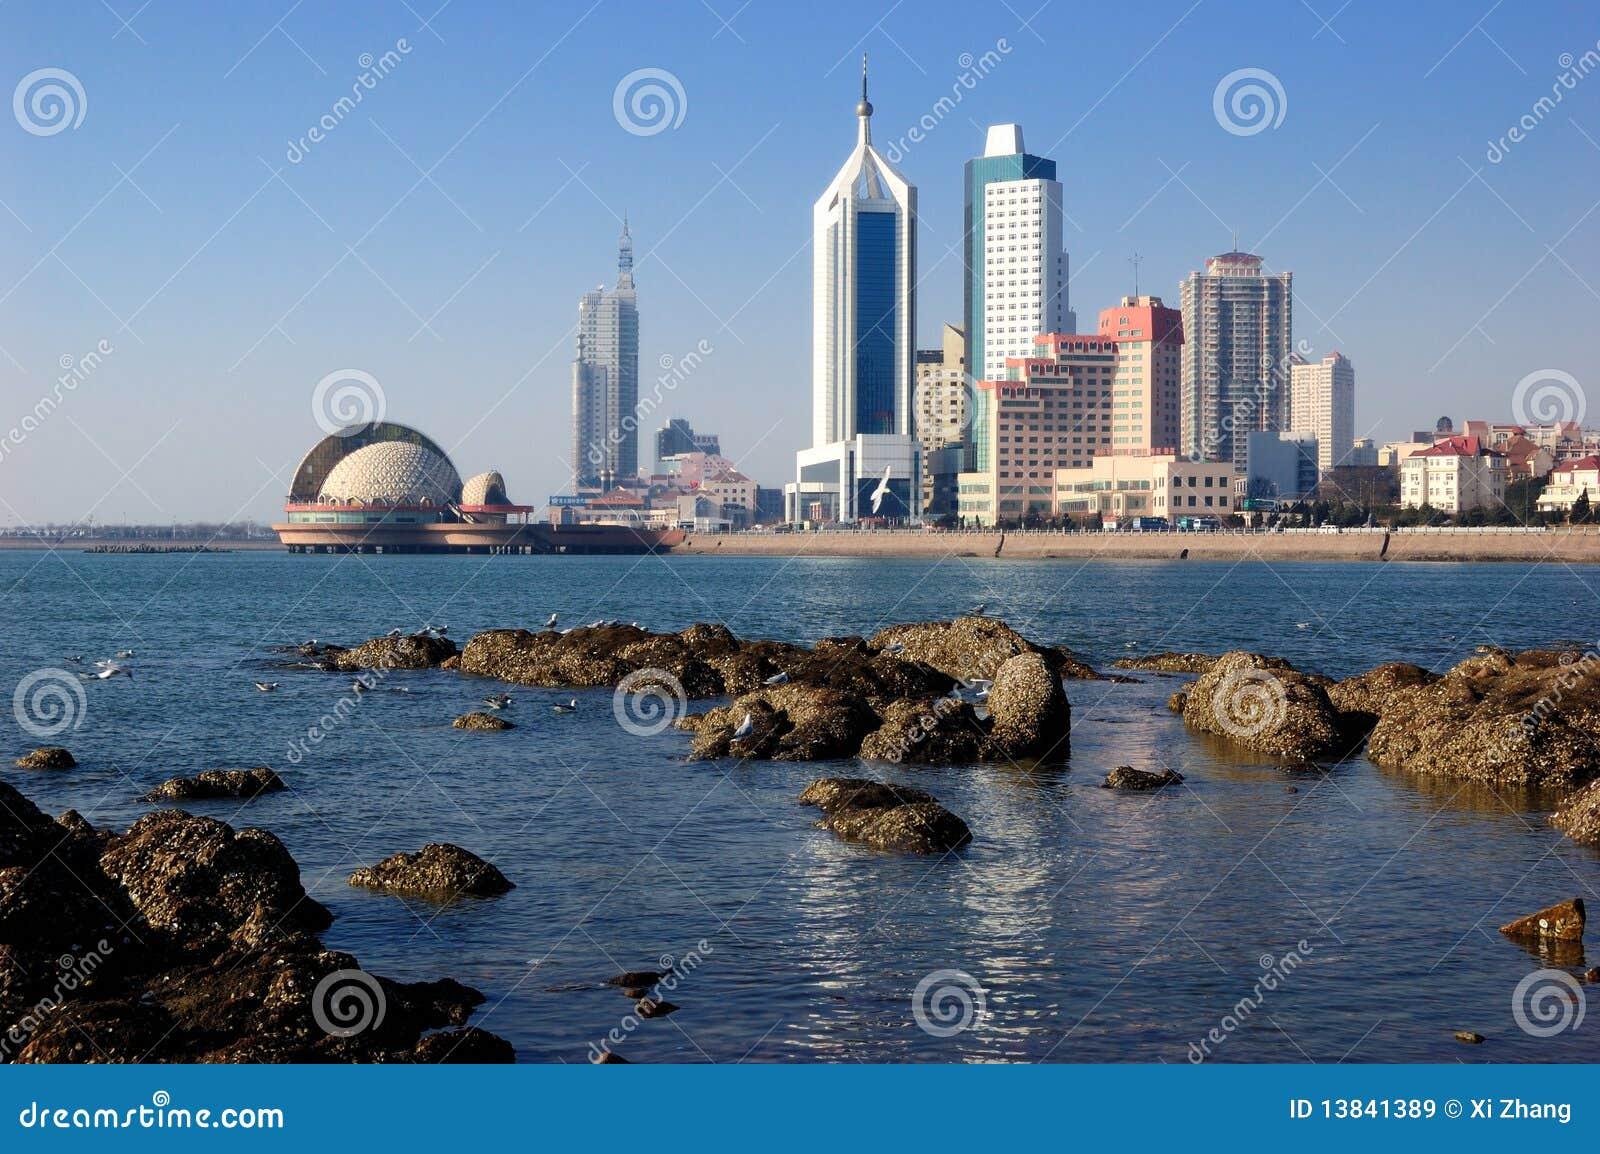 Qingdao city